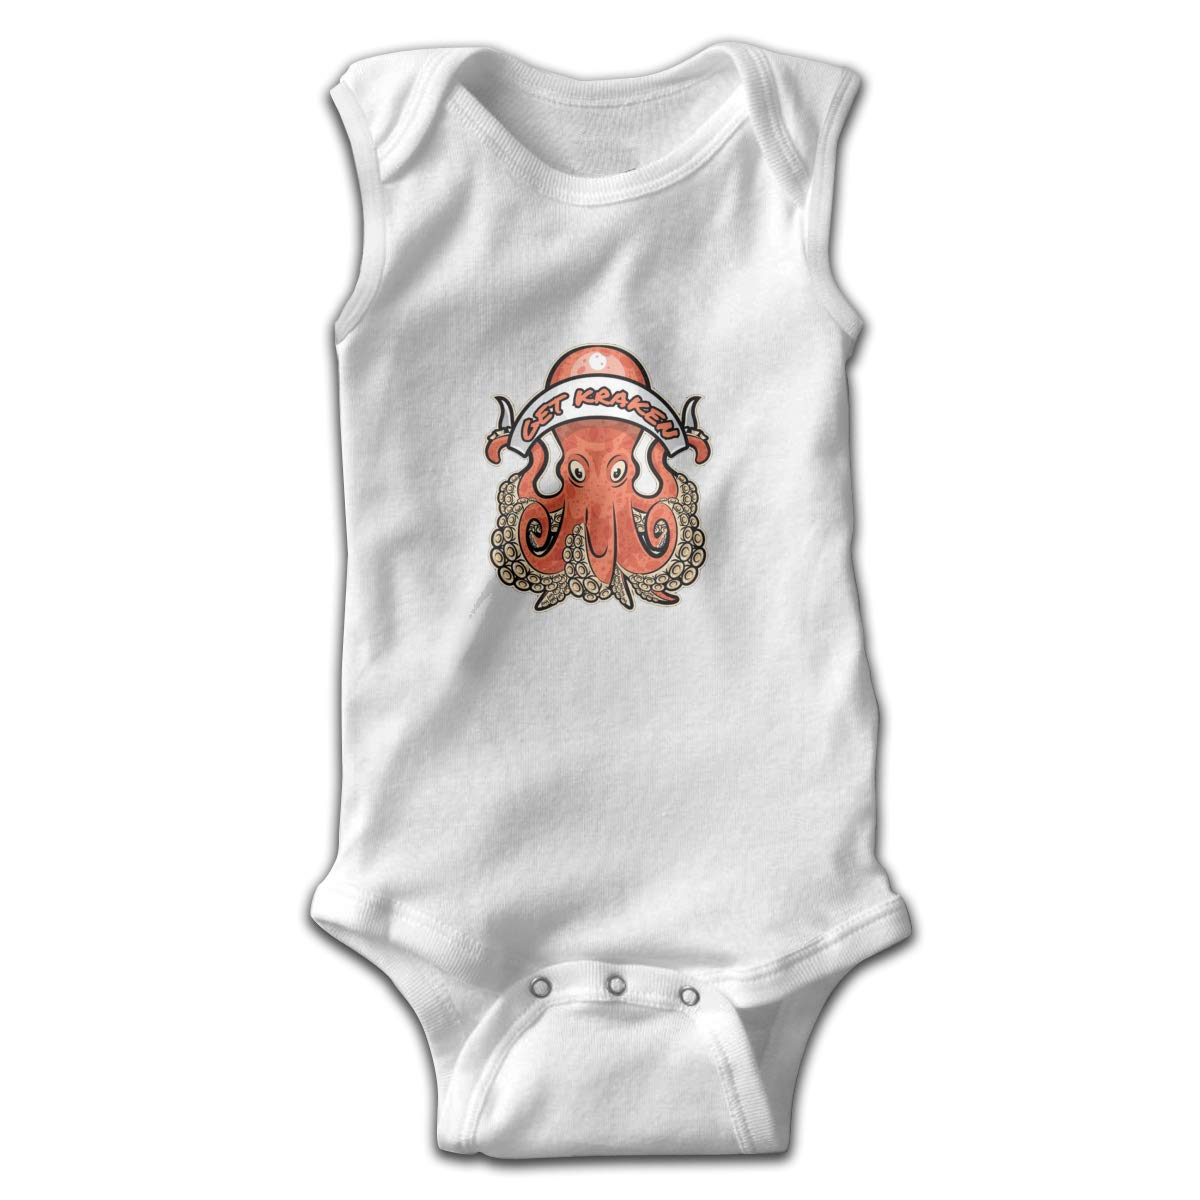 Dfenere Get Kraken Newborn Baby No Sleeve Bodysuit Romper Infant Summer Clothing Black